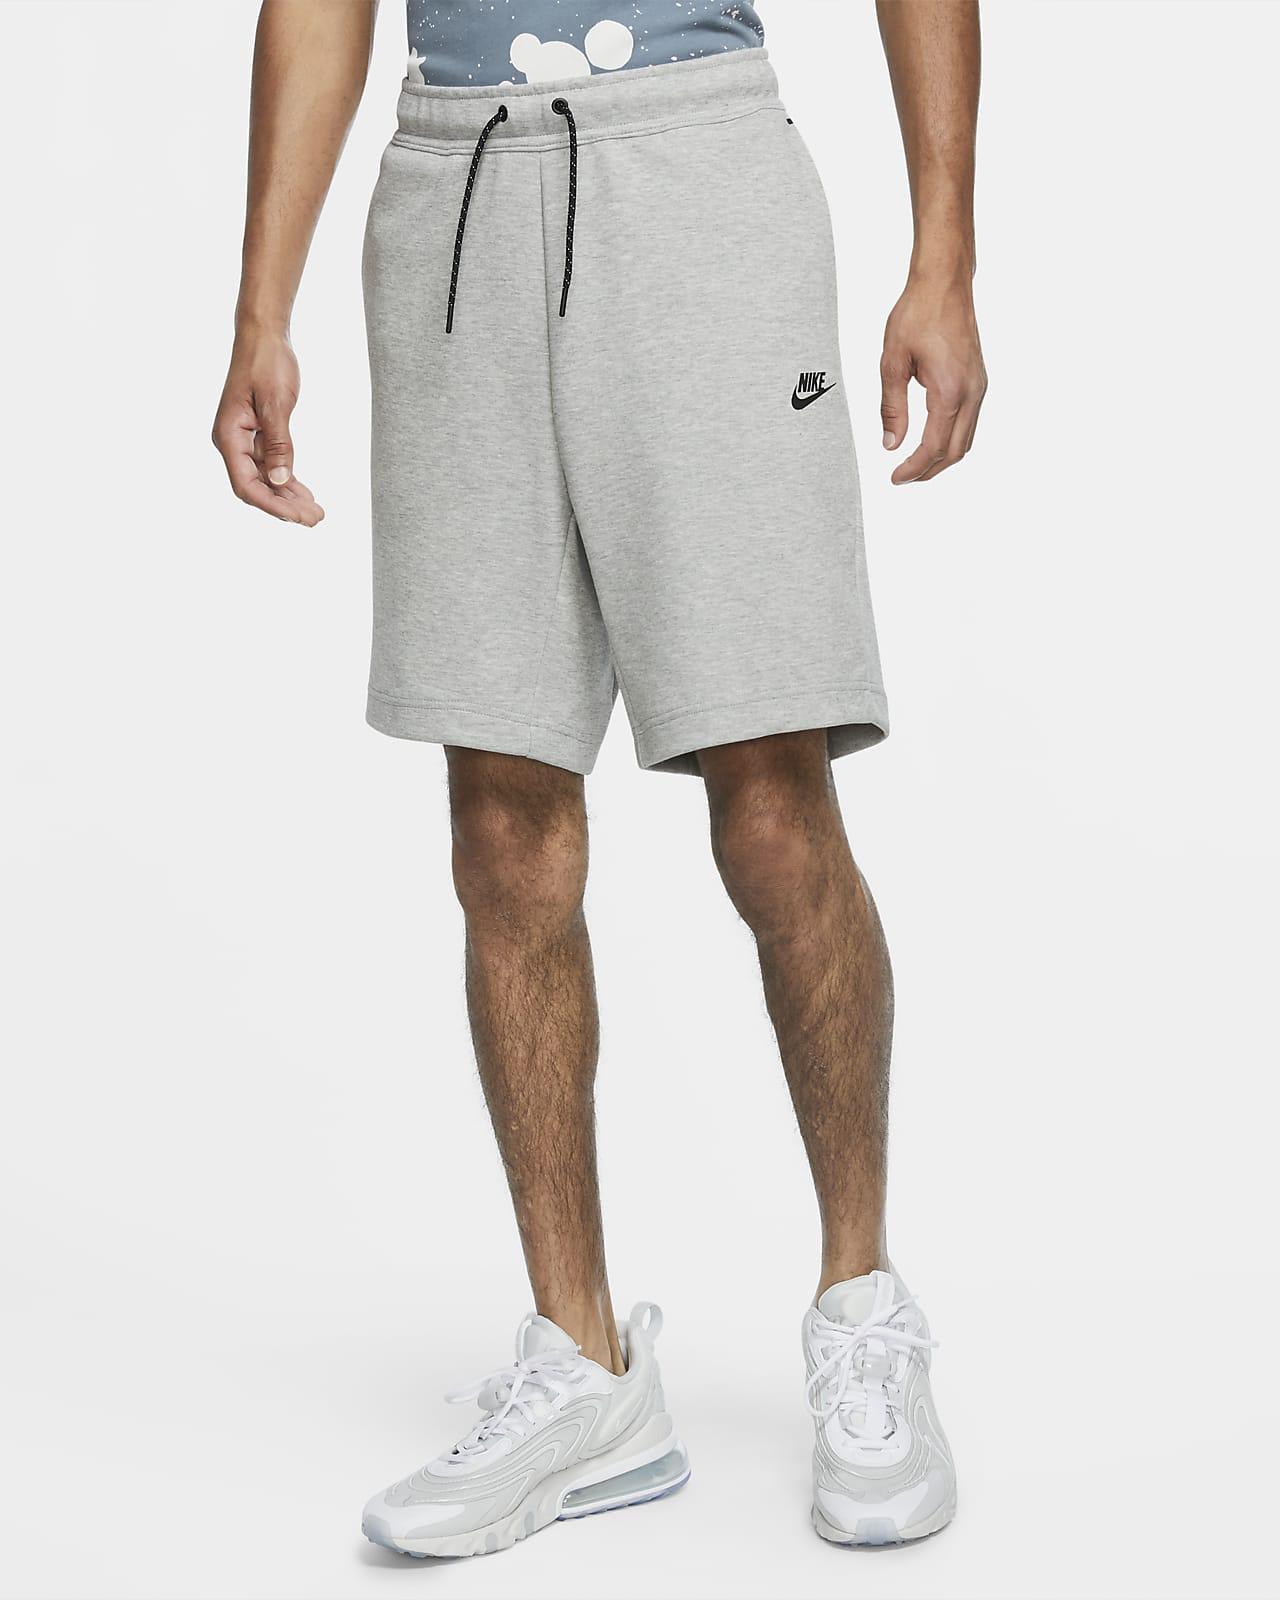 Мужские шорты Nike Sportswear Tech Fleece